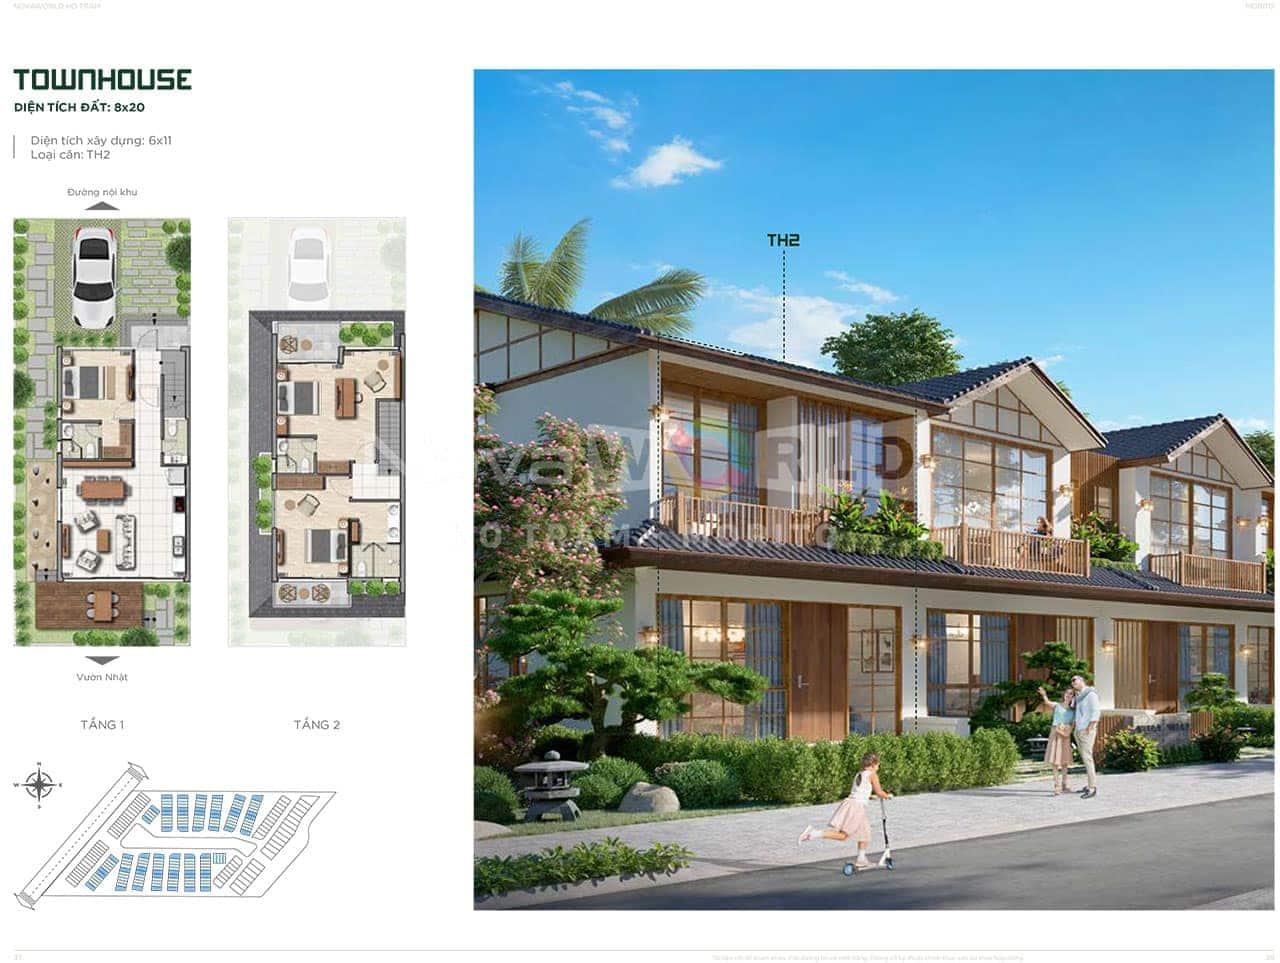 Townhouse 8x20